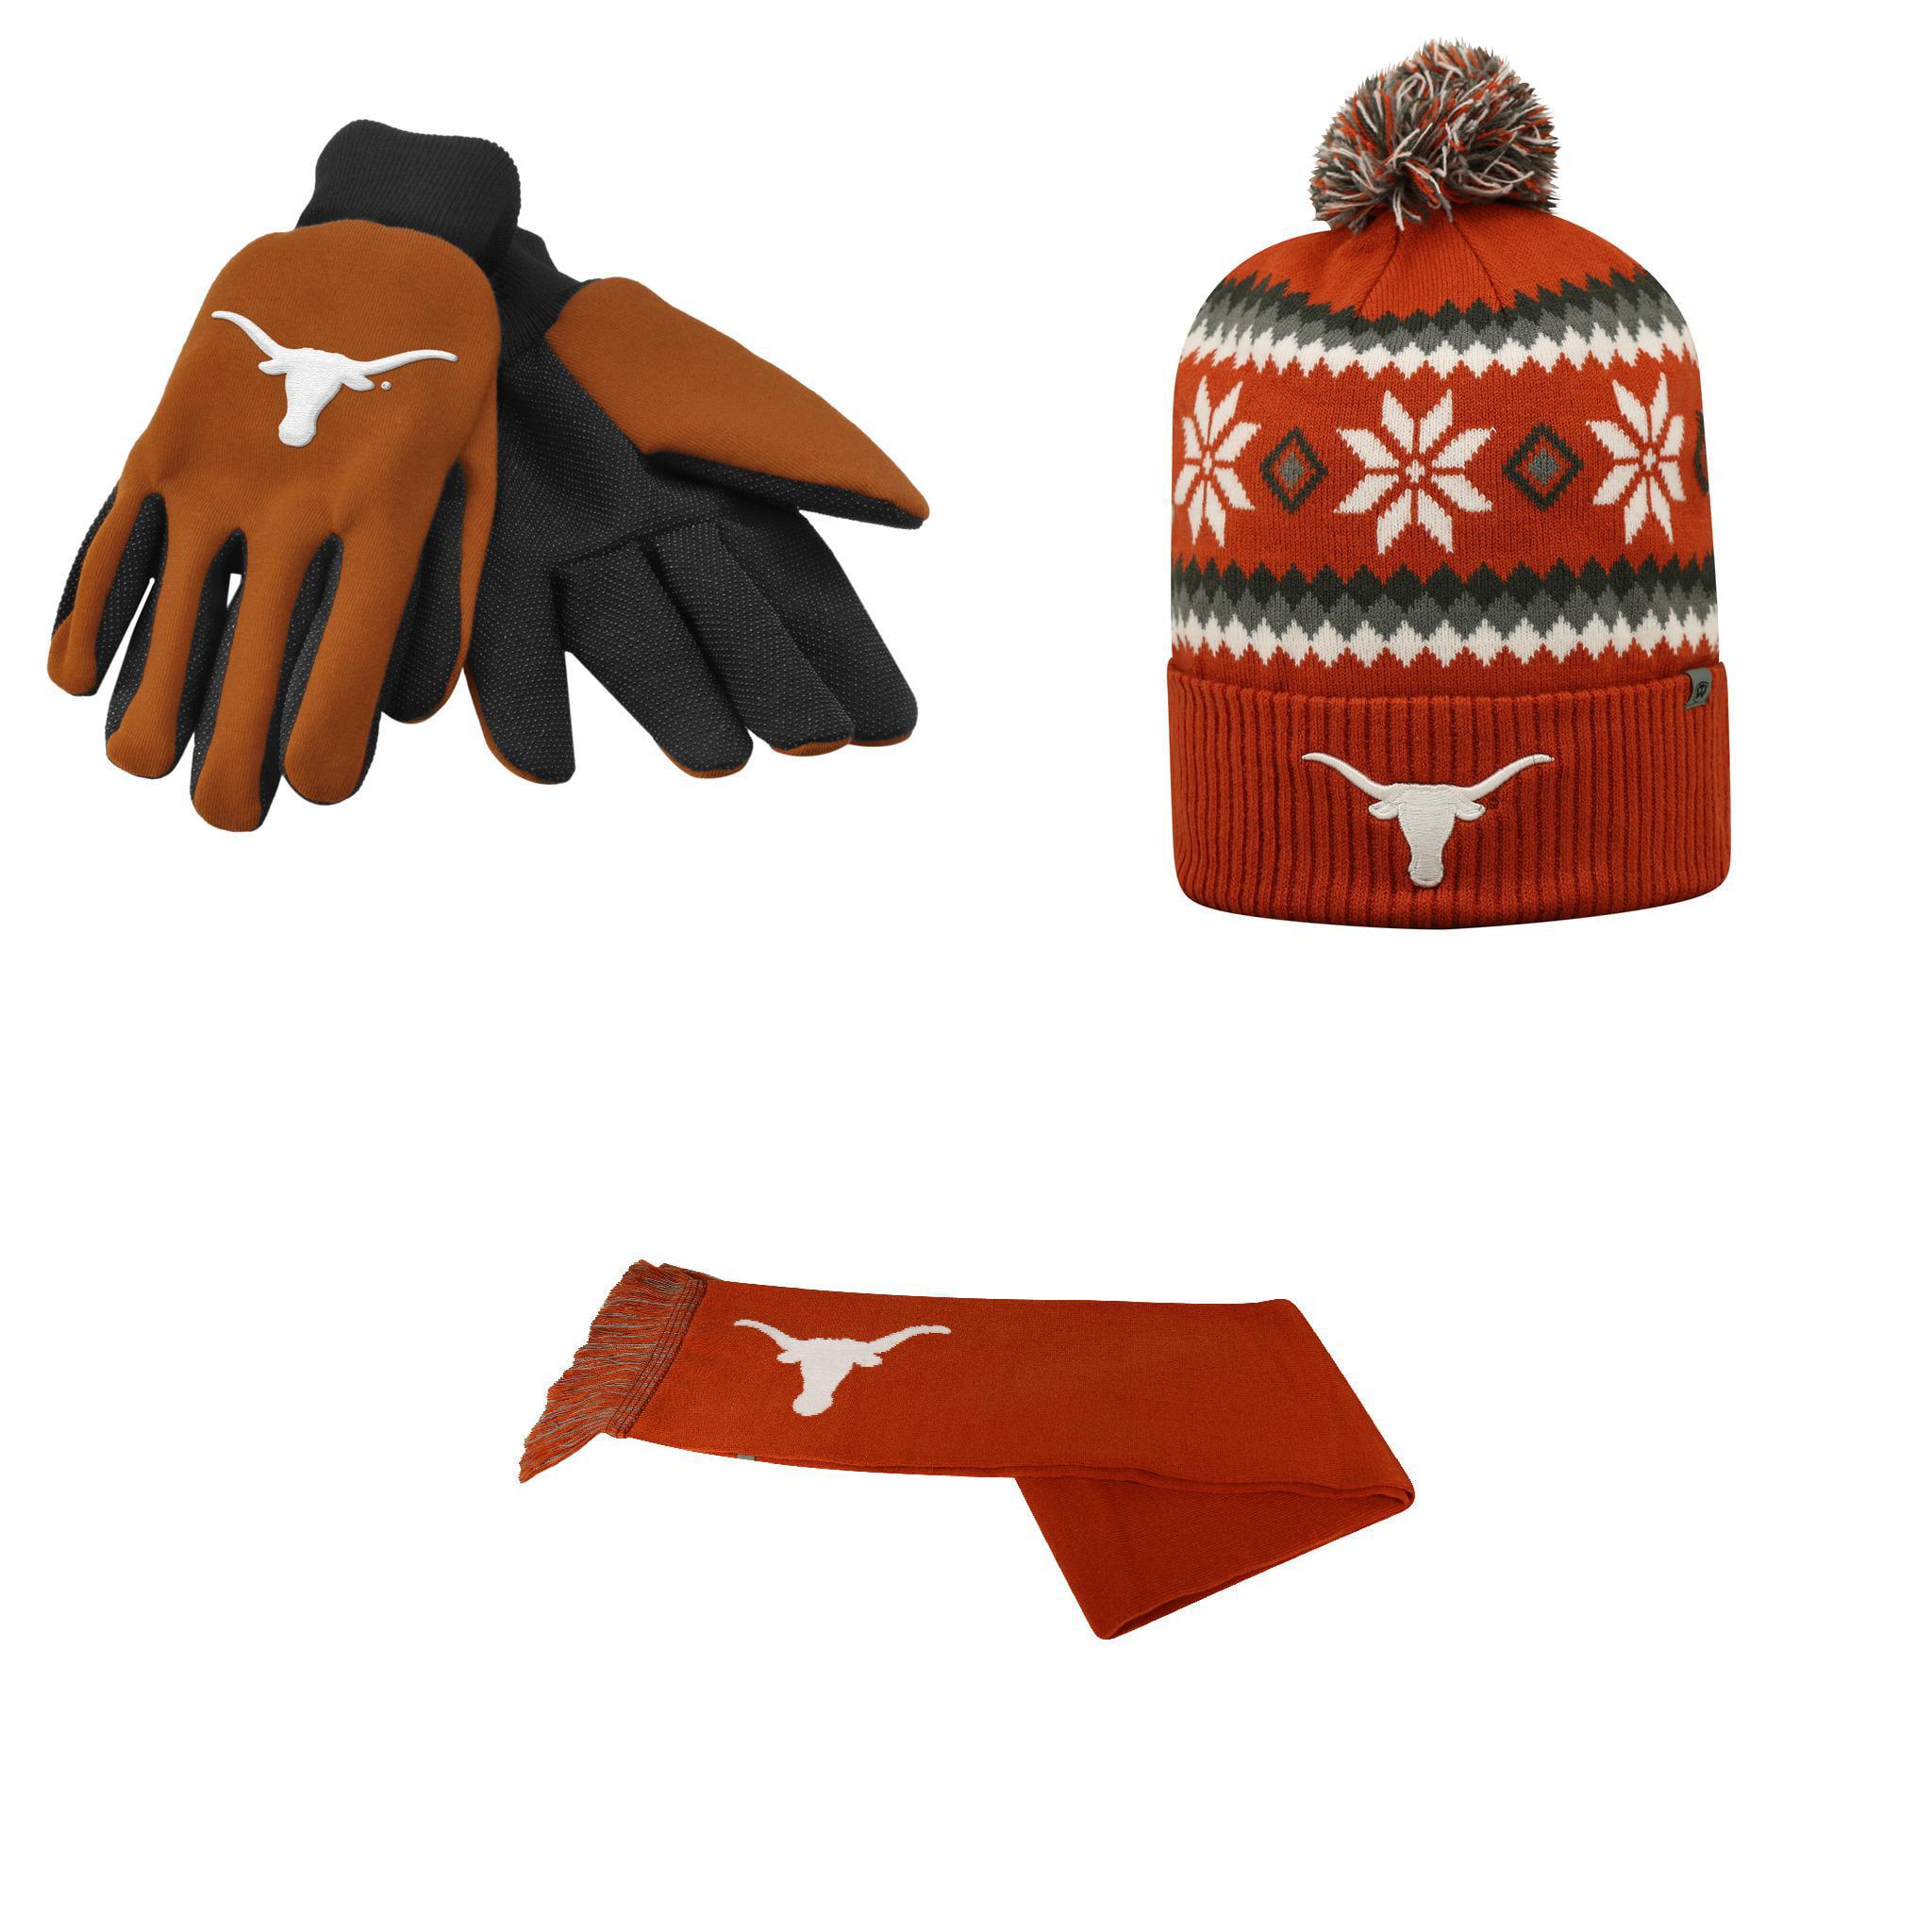 NCAA Texas Longhorns Grip Work Glove Team Logo Scarf And Fogbow Beanie Hat 3 Pack Bundle